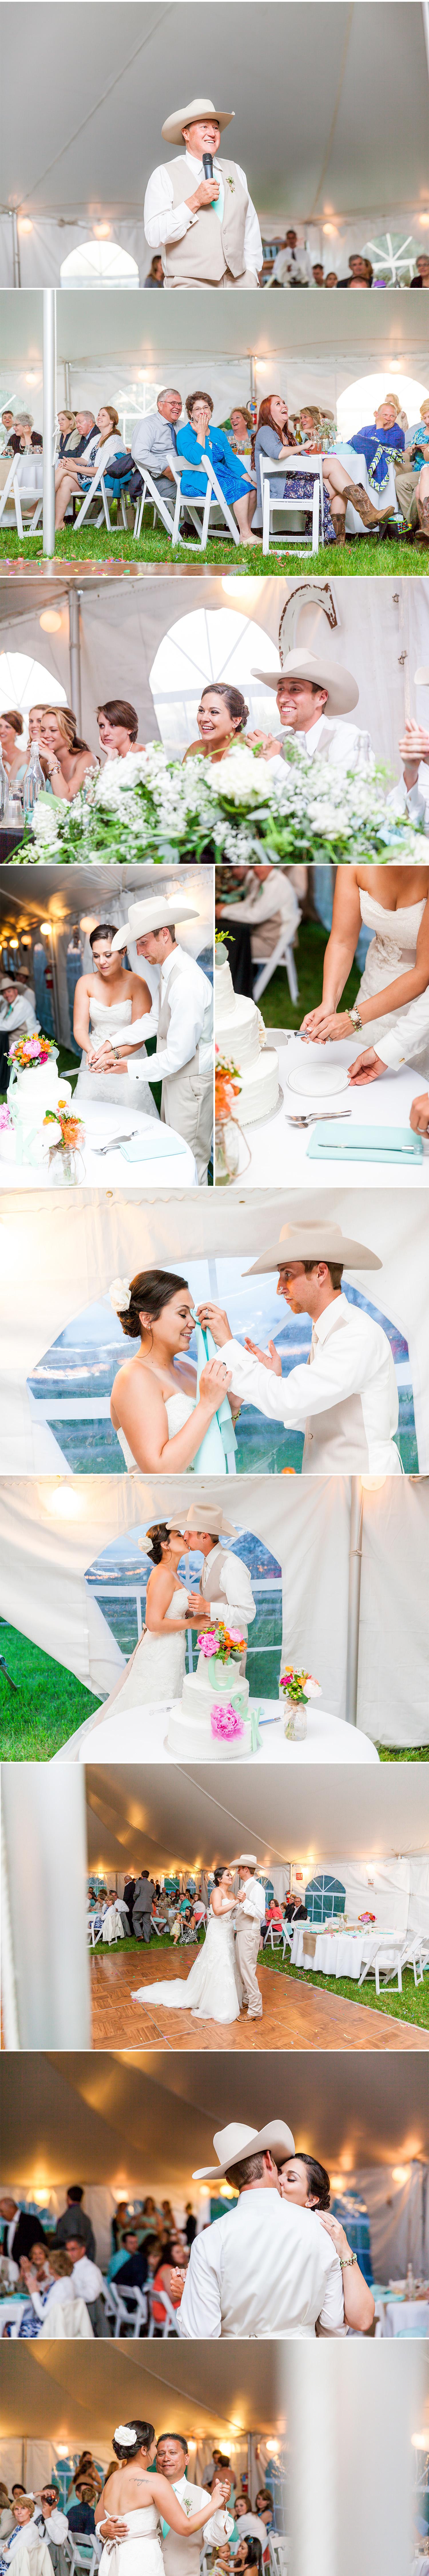 9_colorado wedding photographer.jpg